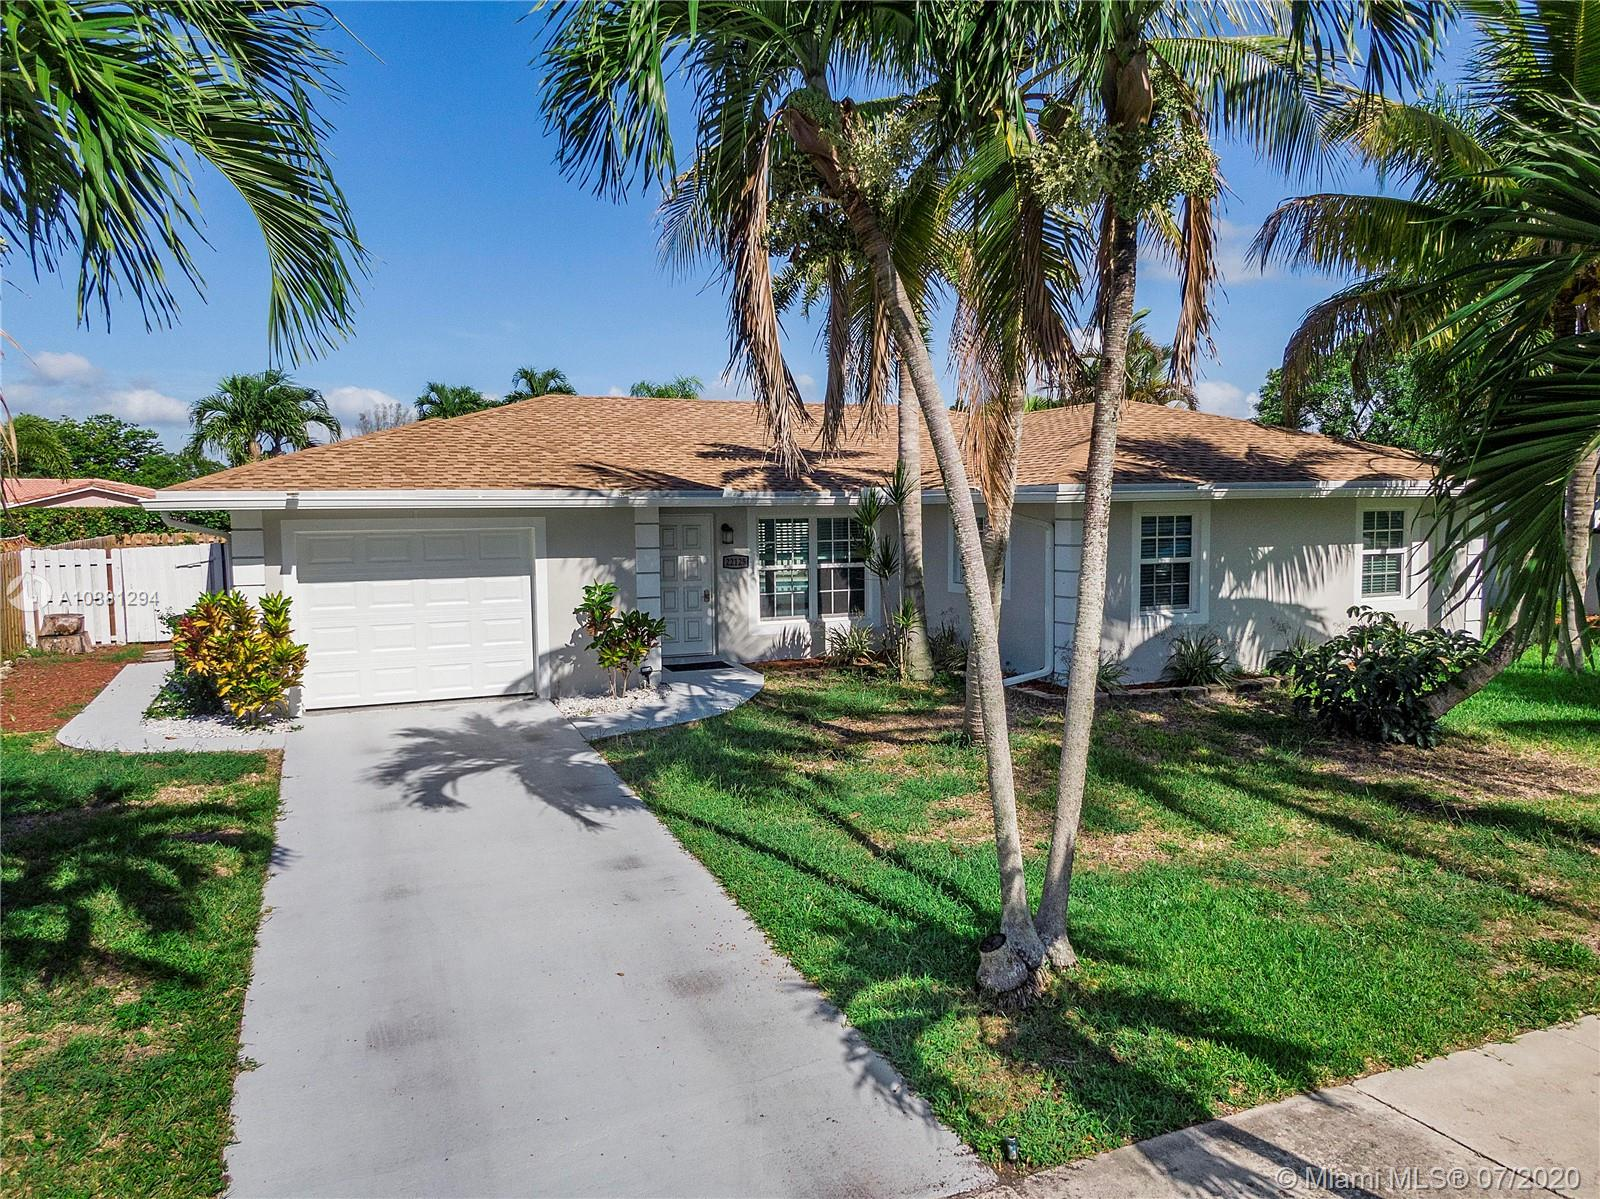 Property for sale at 22125 Aslatic St, Boca Raton,  Florida 33428